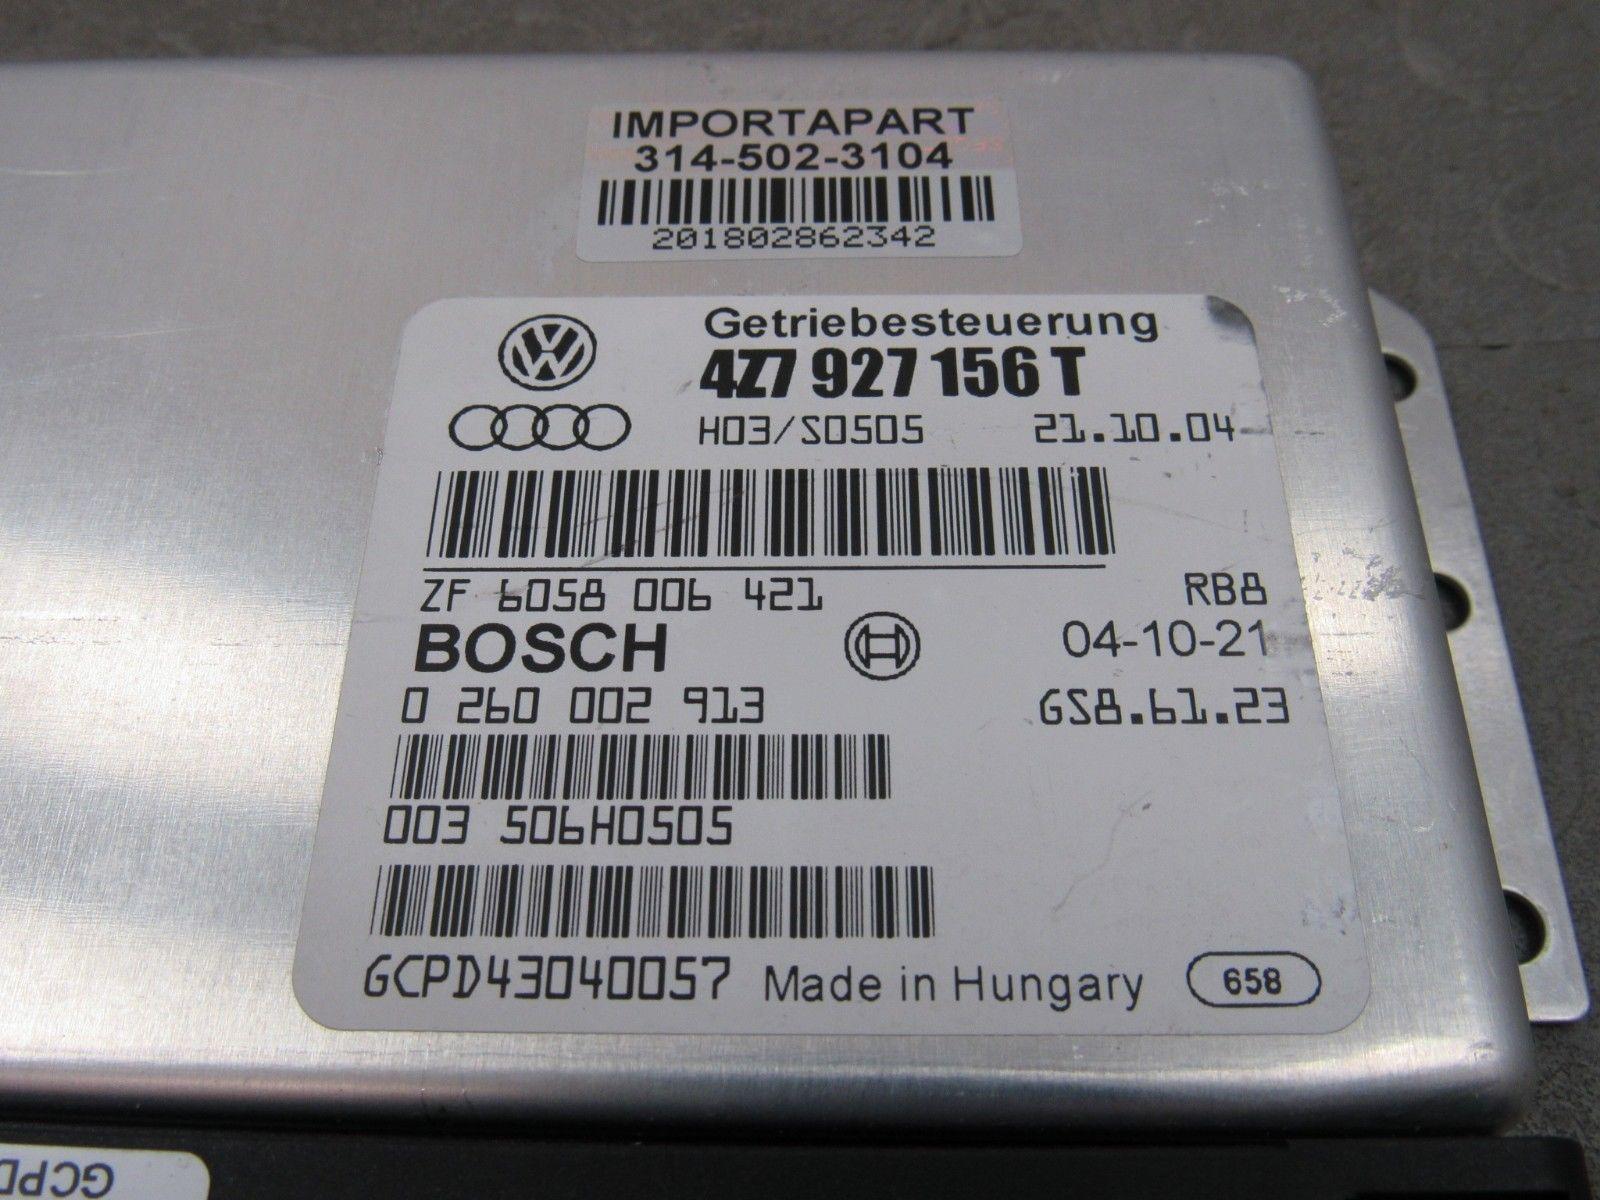 05 Audi Allroad 2 7T TCU TCM Transmission Control Module Unit 4Z7 927 156 T  A